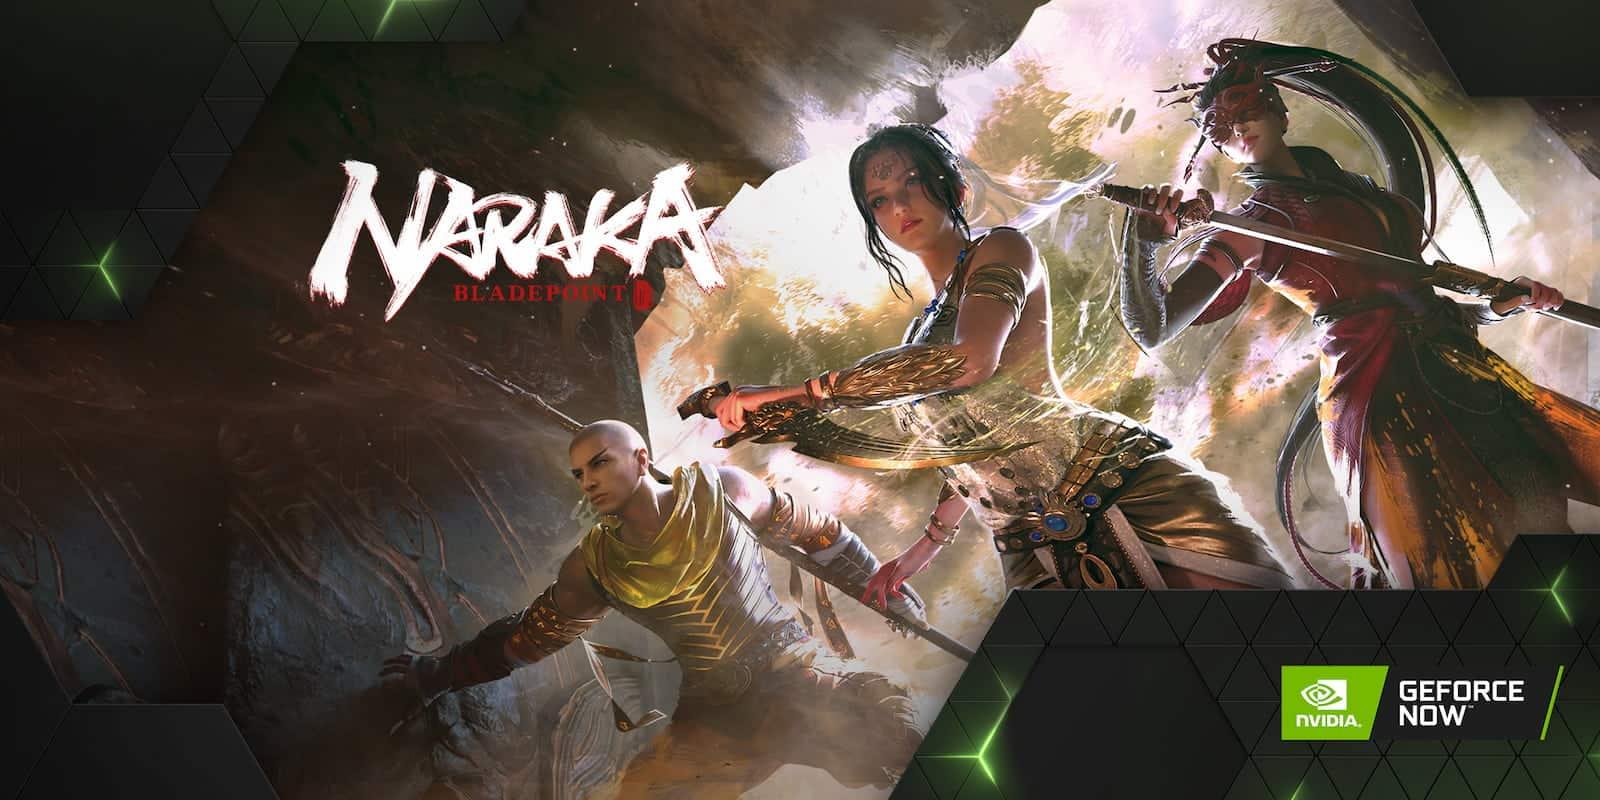 GeForce NOW Naraka Bladepoint 1